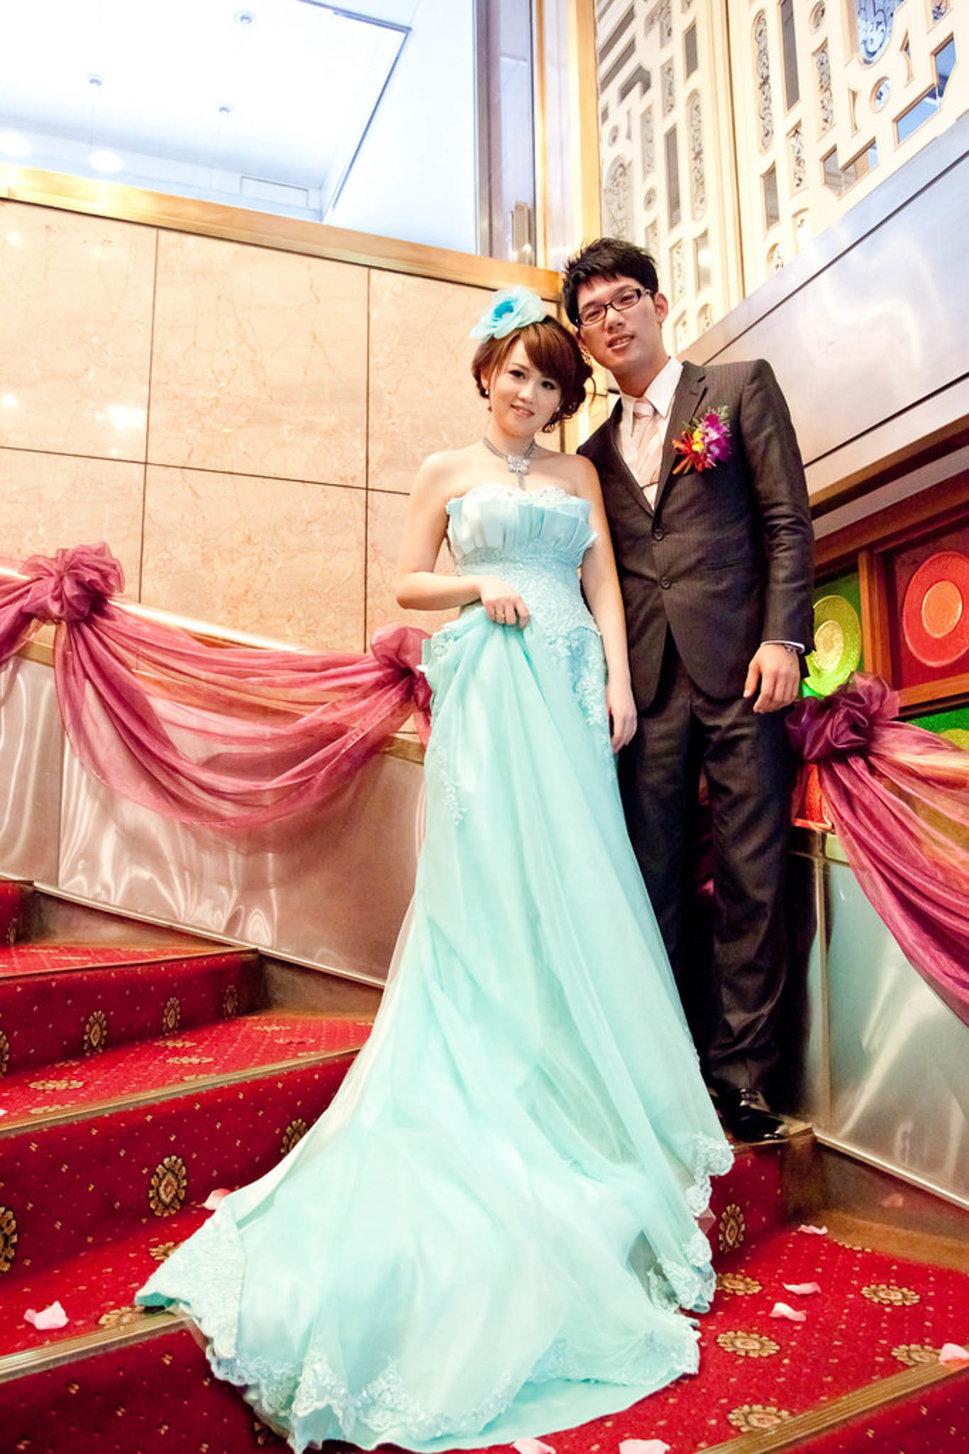 18PHOTO-佳成❤️ 玨萍(編號:220203) - 18 PHOTO 影像攝影工作室 - 結婚吧一站式婚禮服務平台